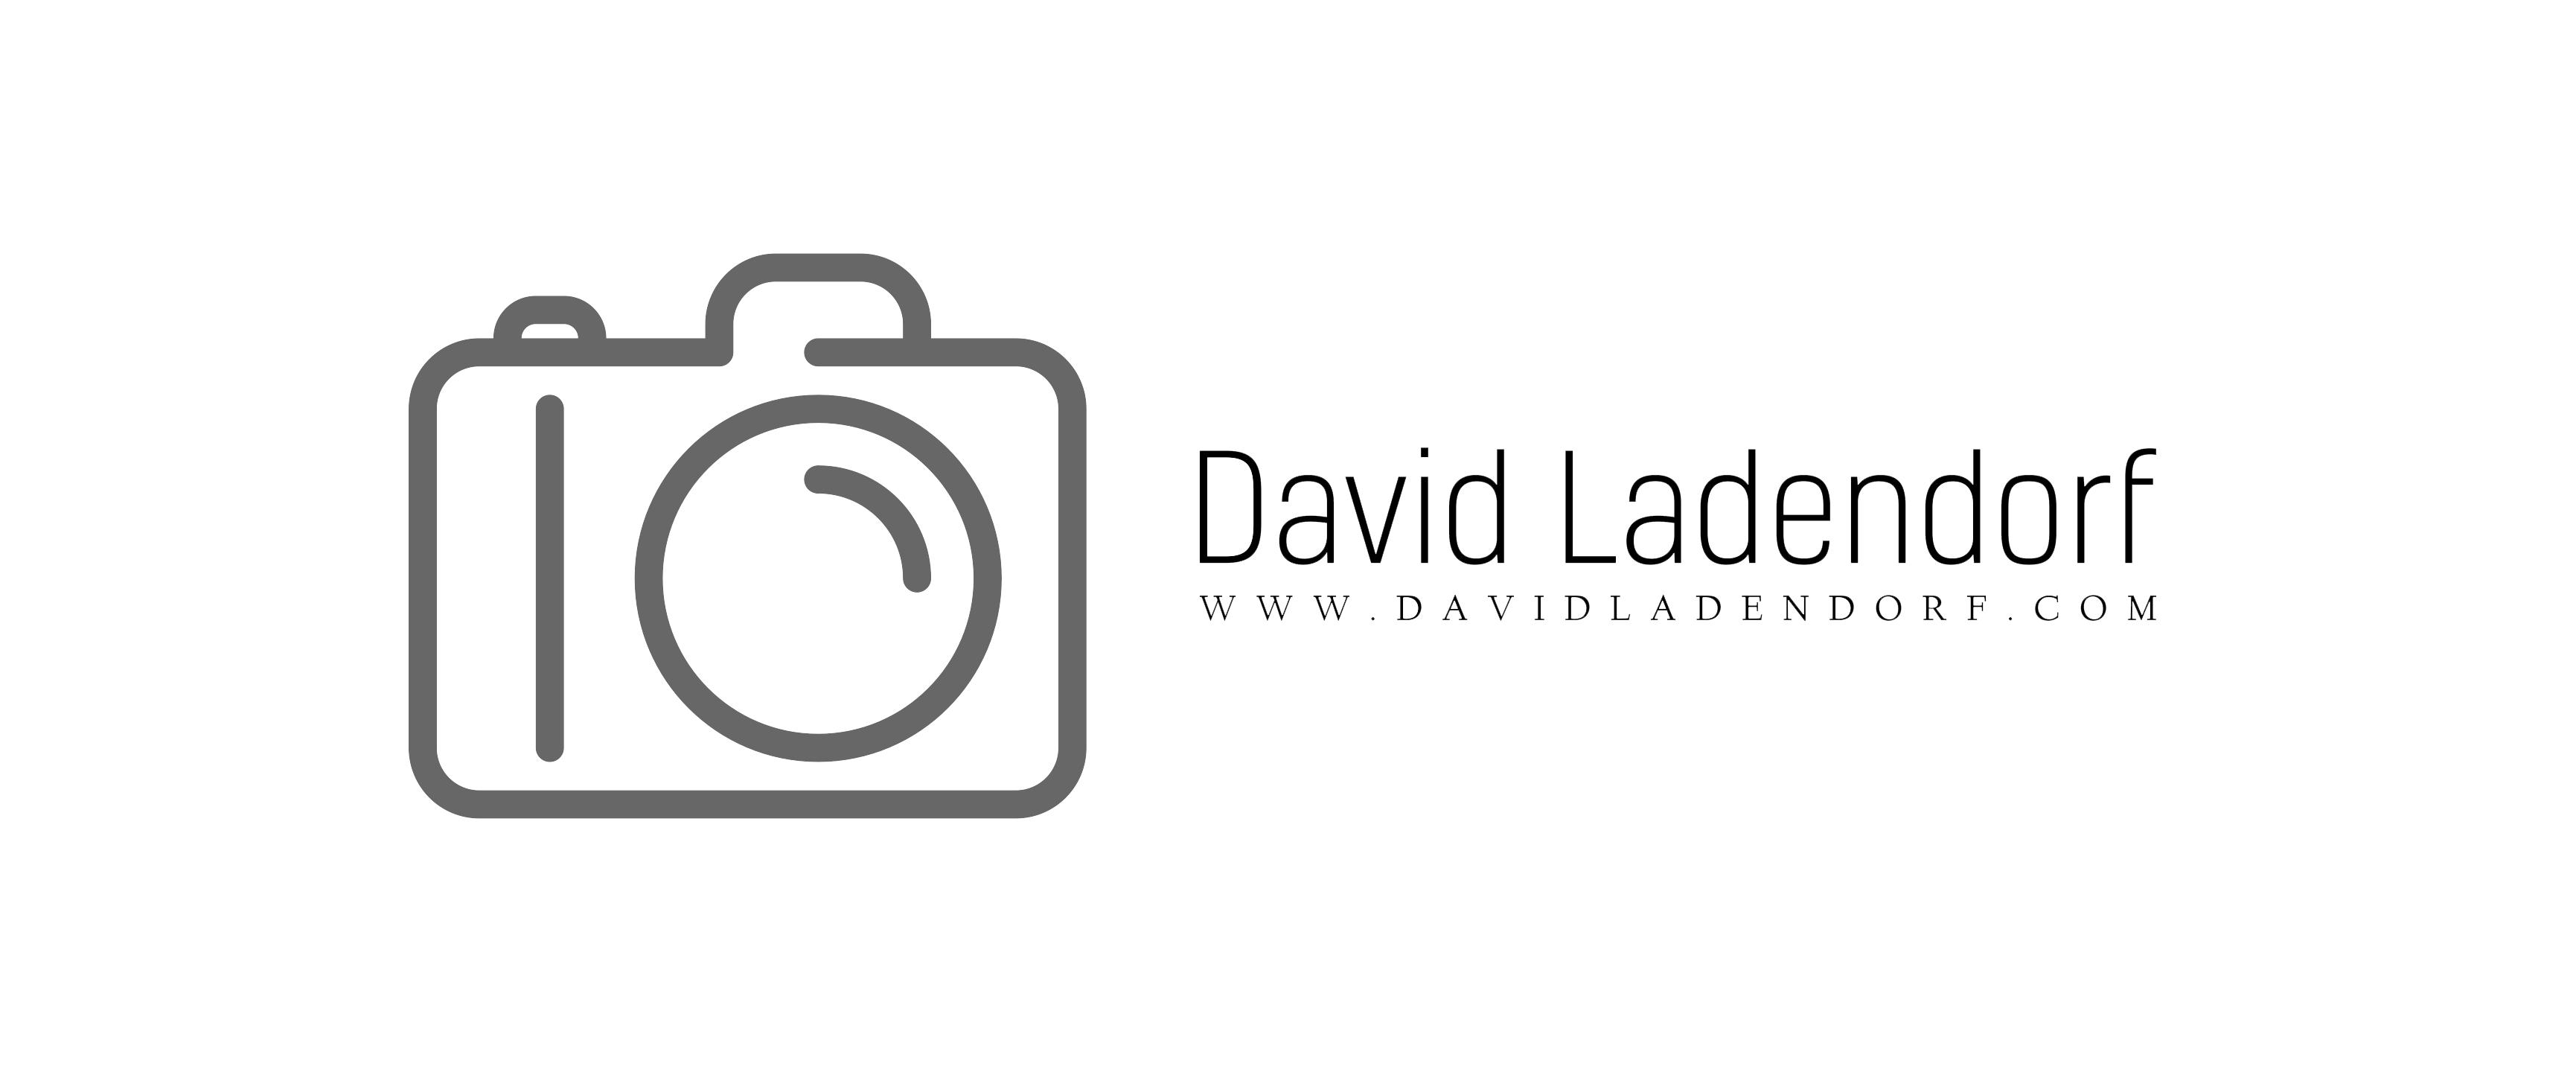 David ladendorf